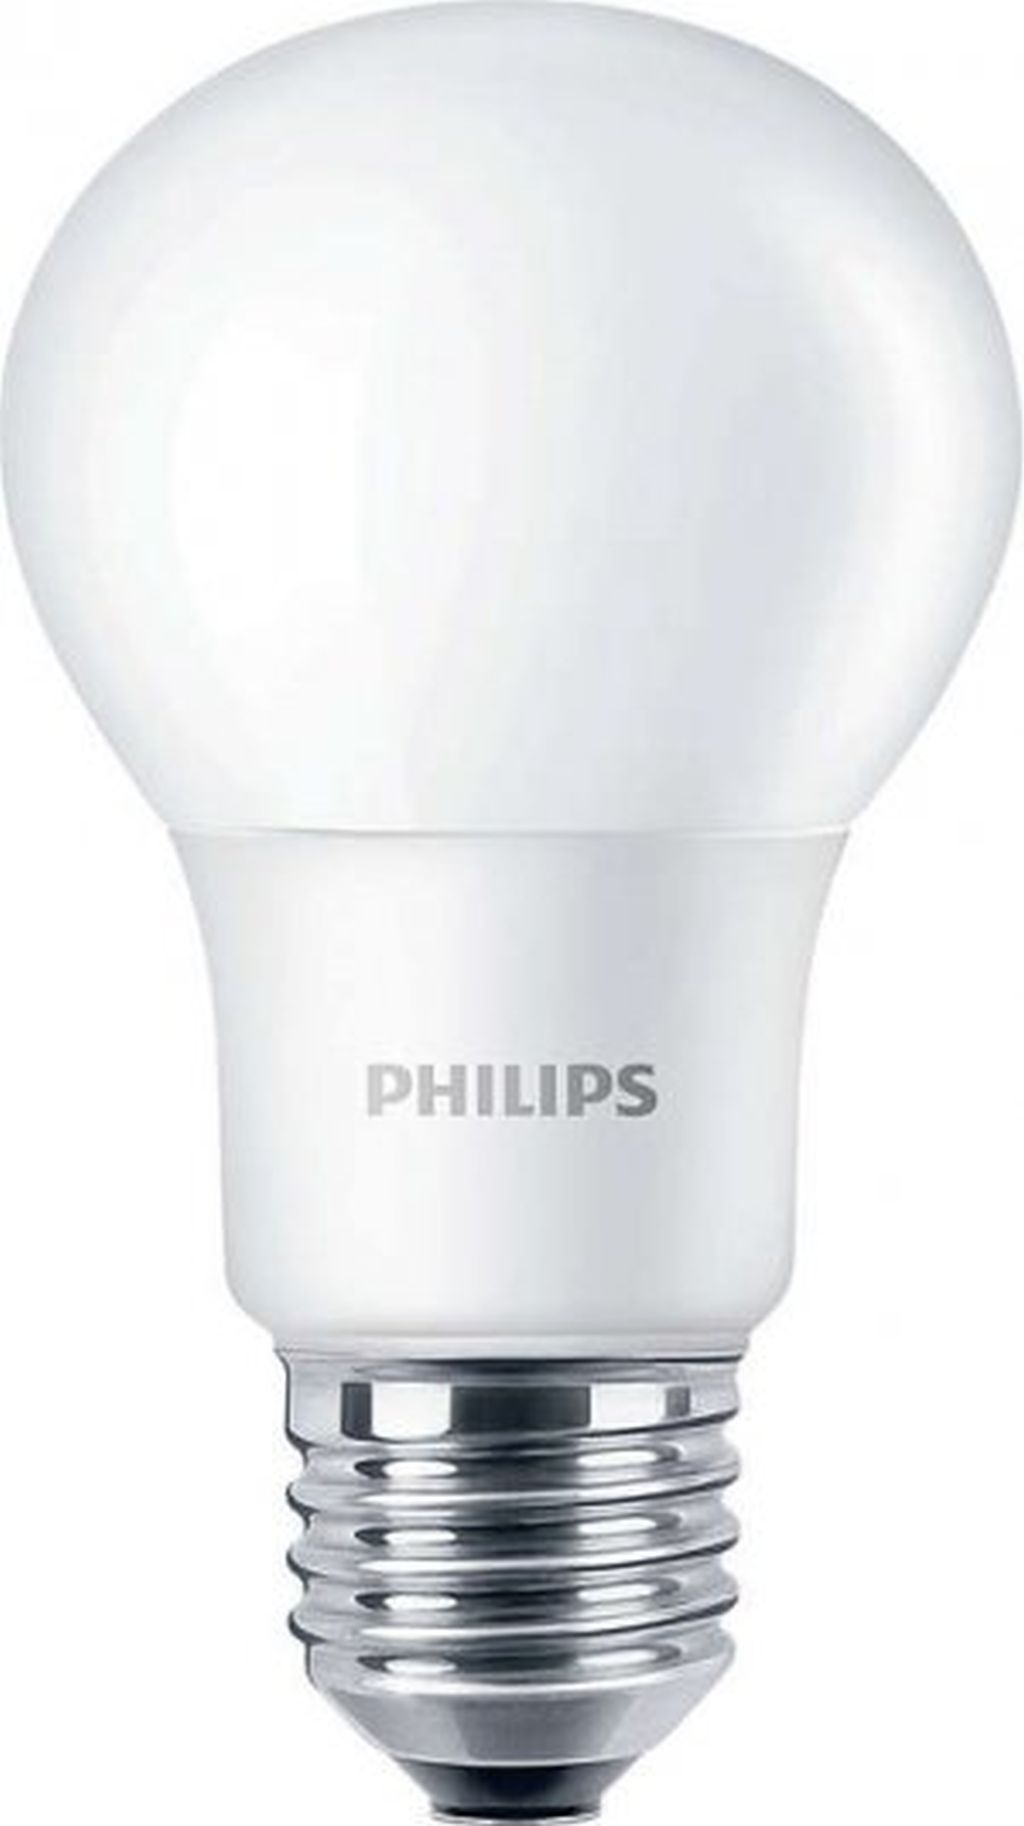 PHILIPS COREPRO LEDbulb 6-40W E27 840 žárovka 8718696510360